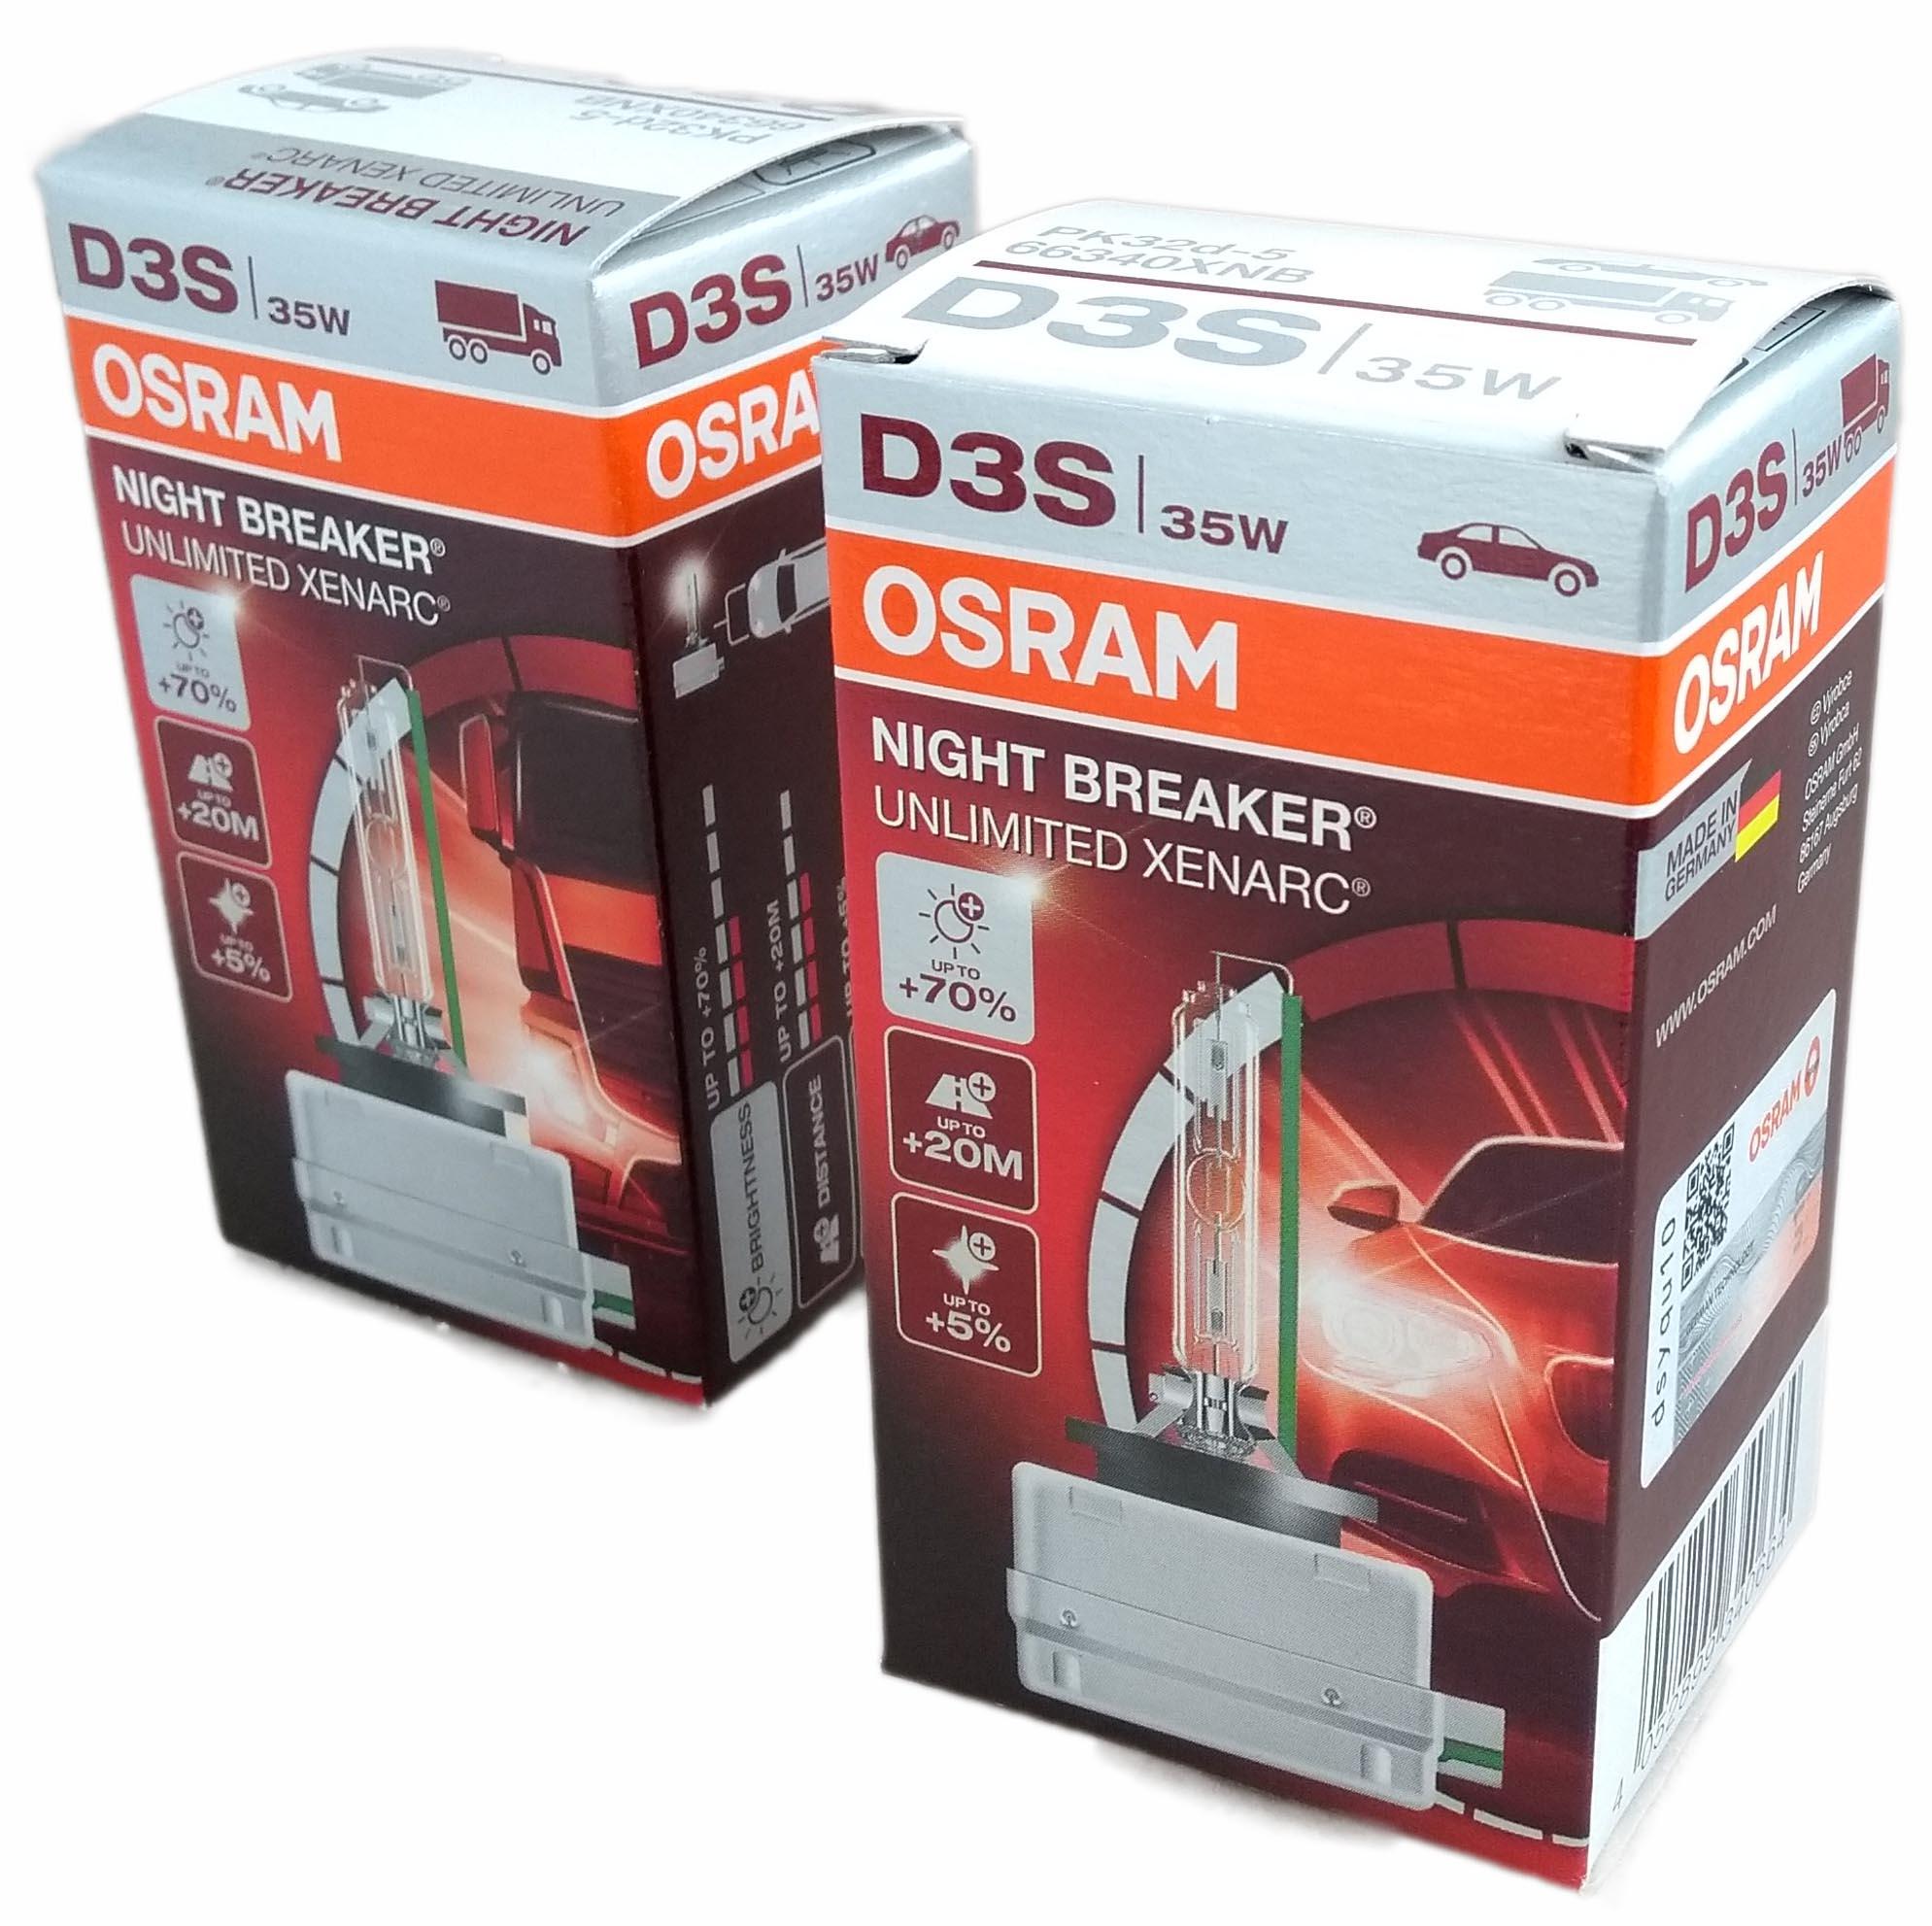 osram d3s night breaker unlimited xenarc xenon brenner 70 2 stk 66340xnb ebay. Black Bedroom Furniture Sets. Home Design Ideas